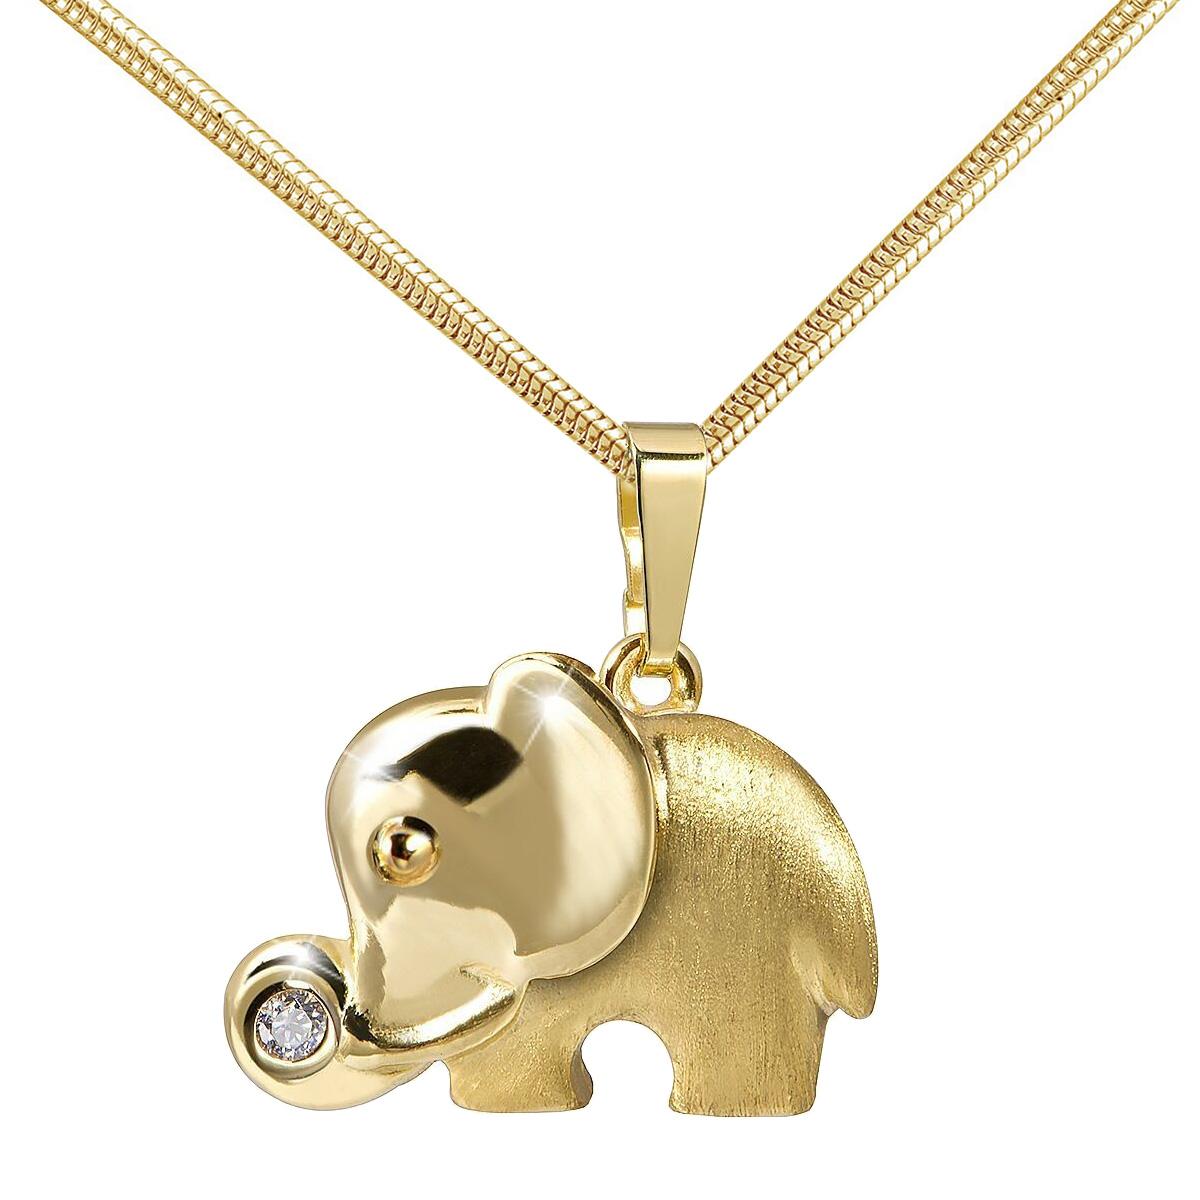 MATERIA 333 Gold Kettenanhänger Elefant mit Goldkette